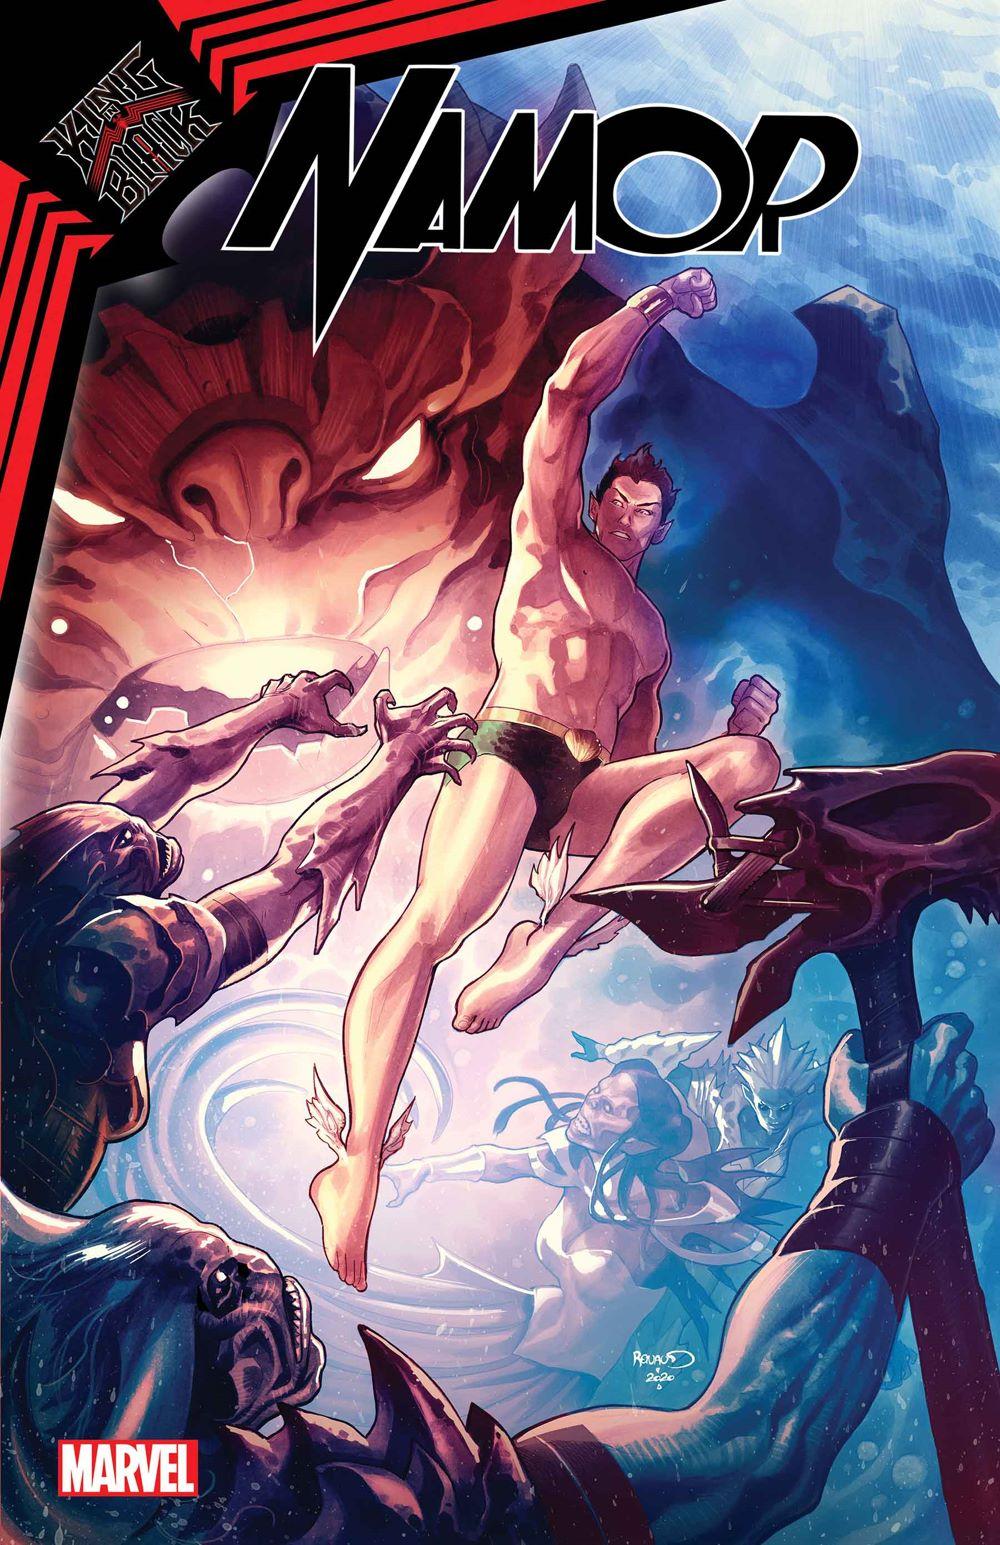 NAMORKIB2020003_Renaud_Var-1 Marvel Comics January 2021 Solicitations